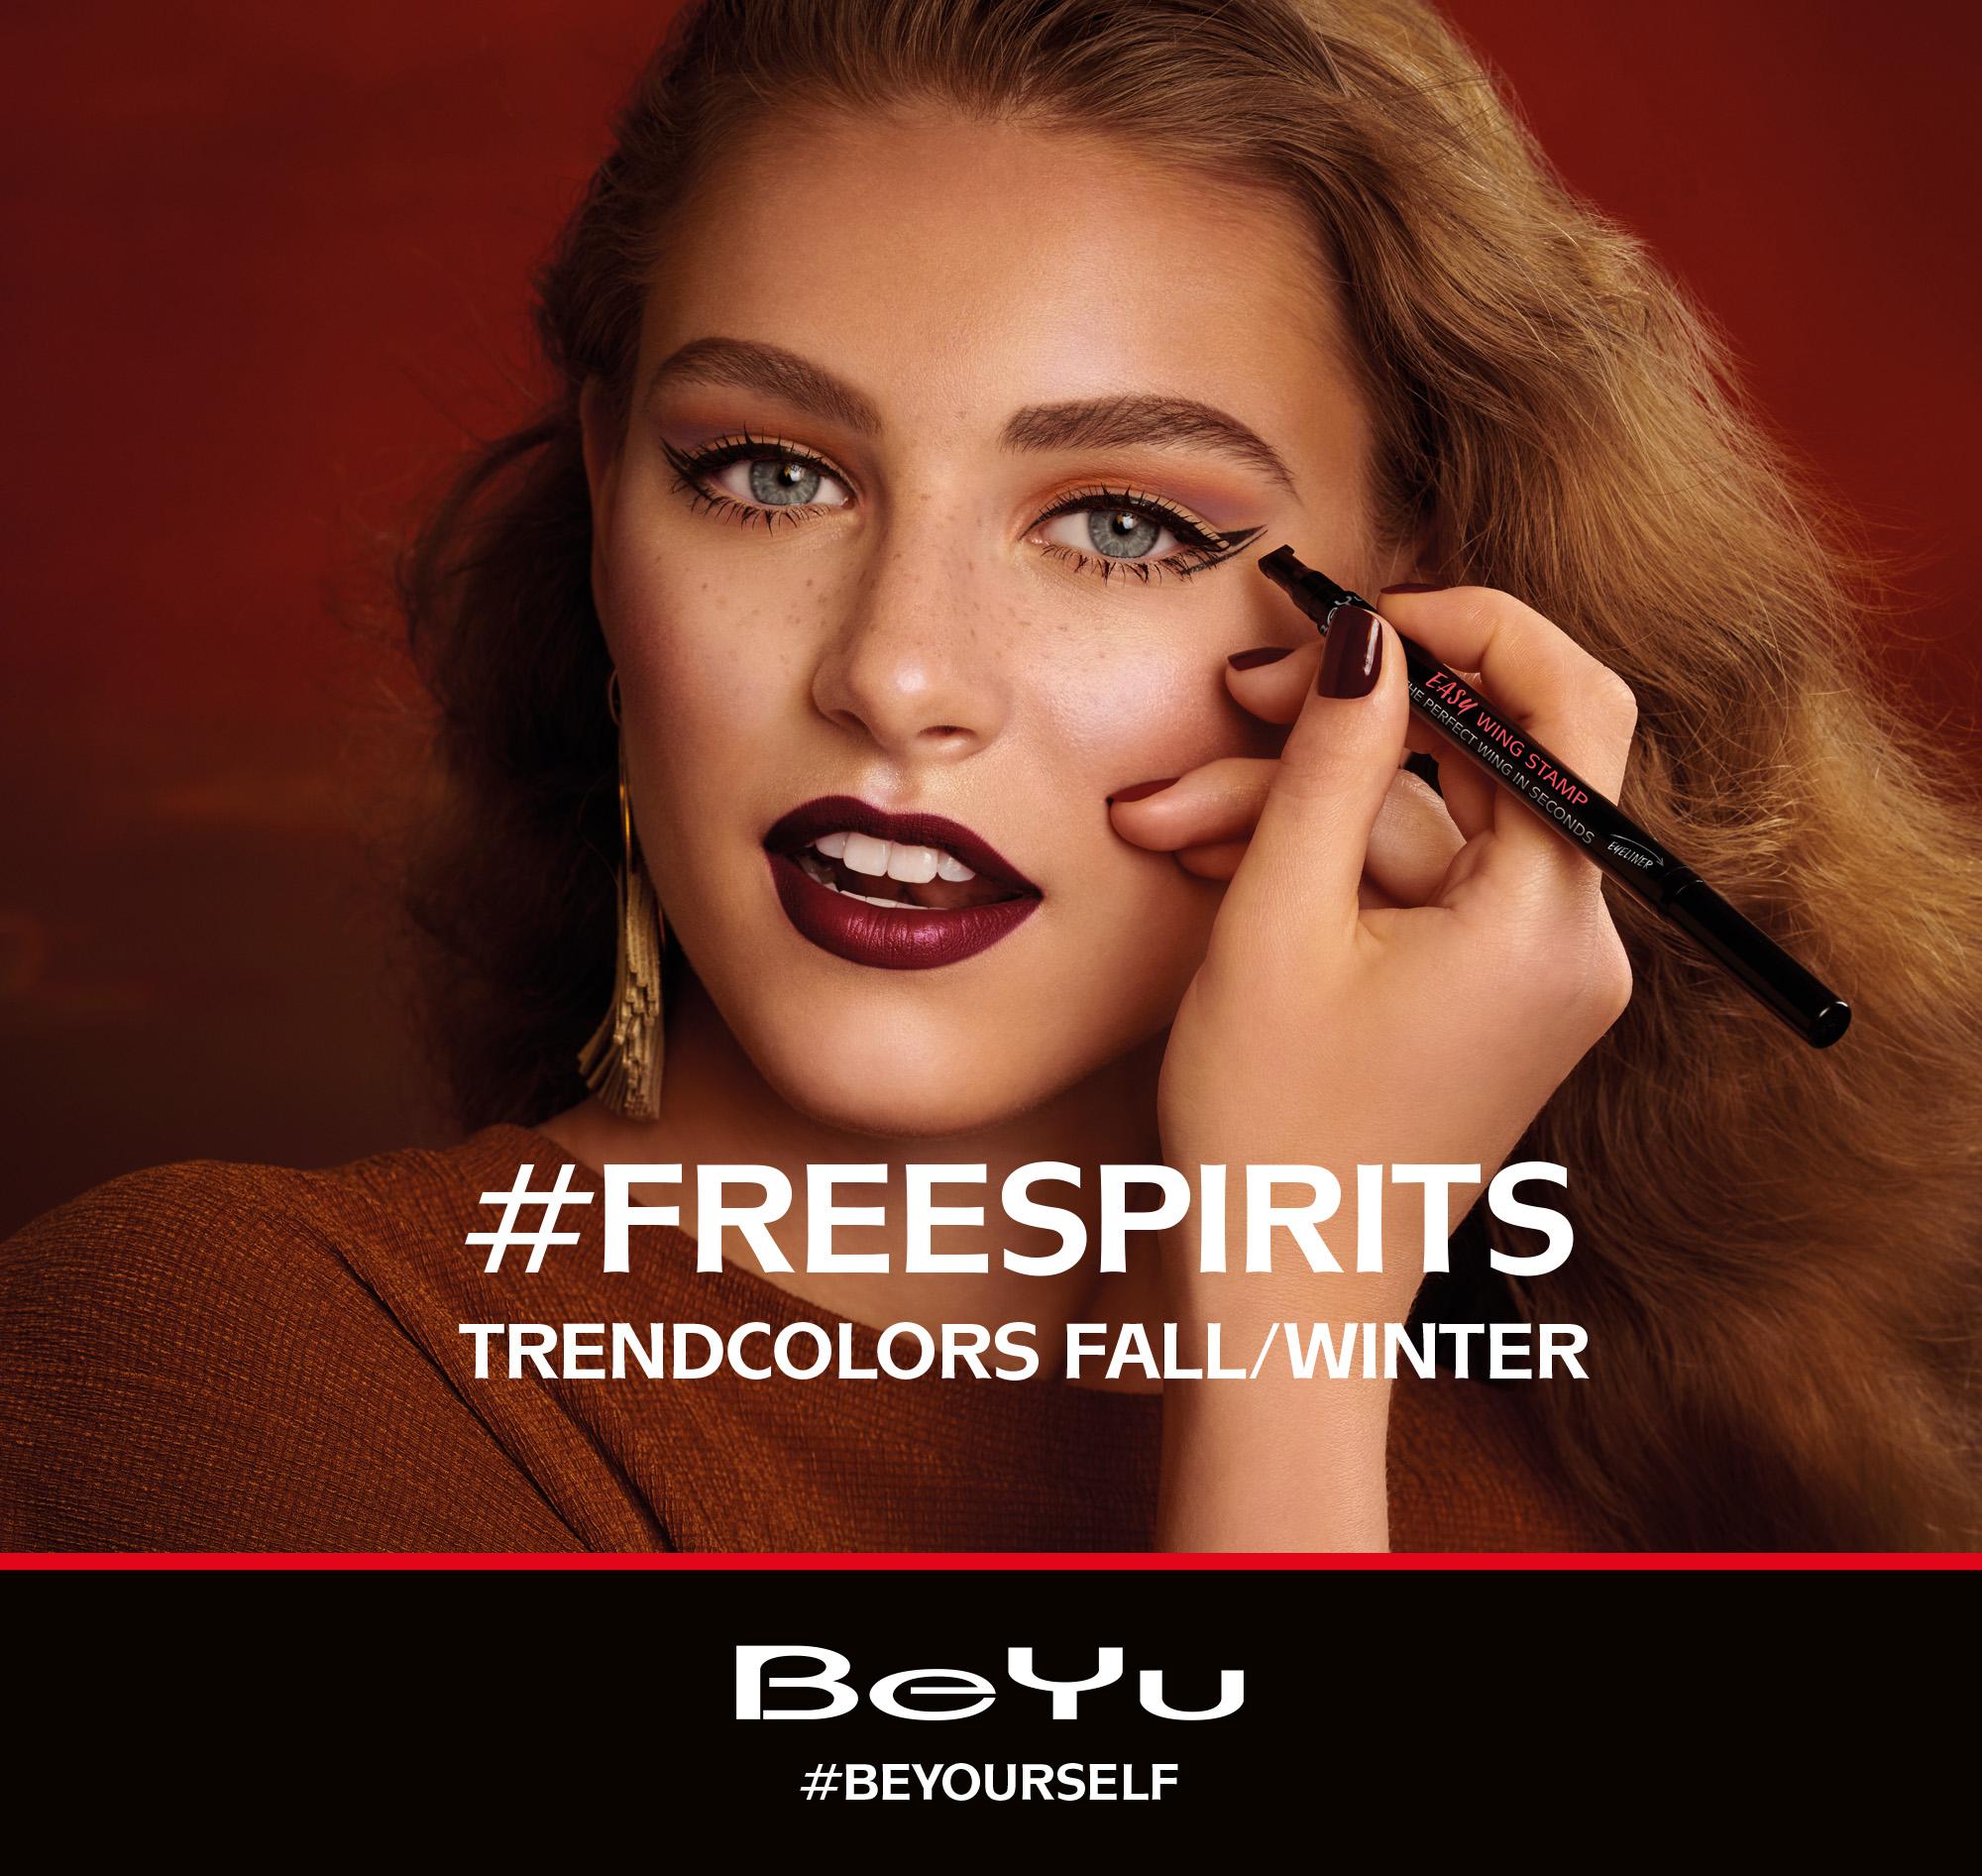 Andreas Ortner Milkcitystudio/Hair Artist Heiko Pallach/Luna Elisa Federowicz Visagistin/Make up Artist BeYu Cosmetics  # FREESTPIRITS